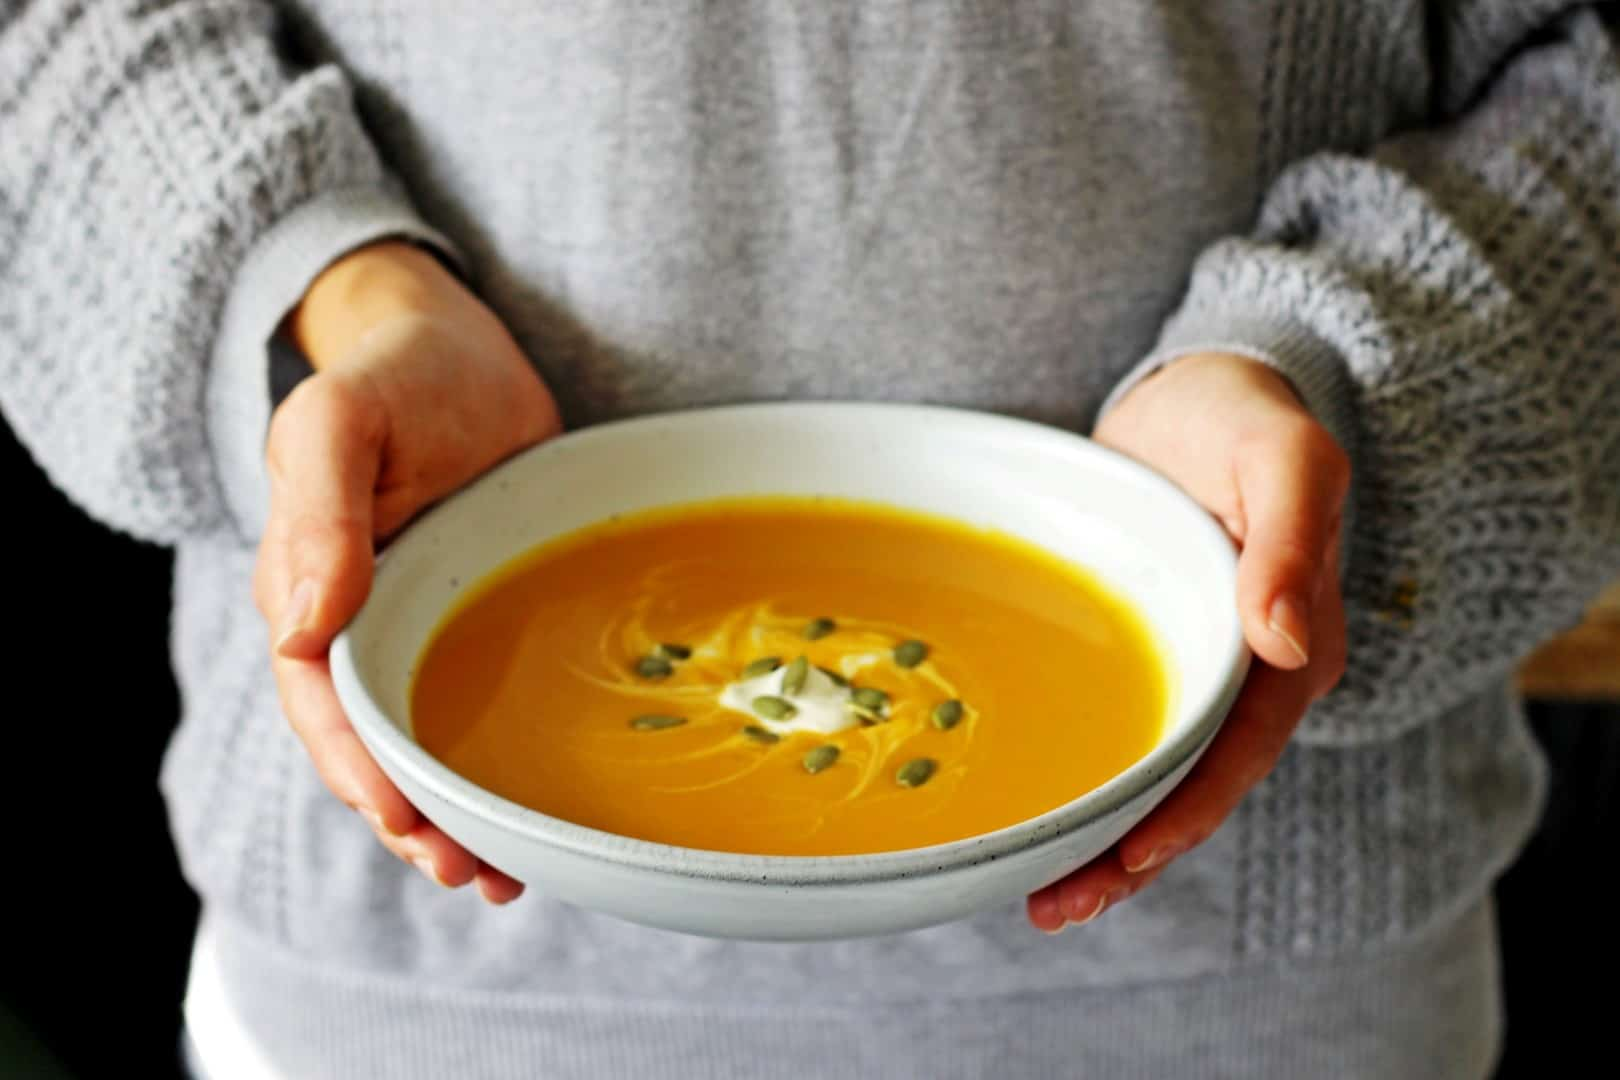 Classic pumpkin soup with a Thai inspired twist - Thai Spiced Pumpkin Soup!   thekiwicountrygirl.com